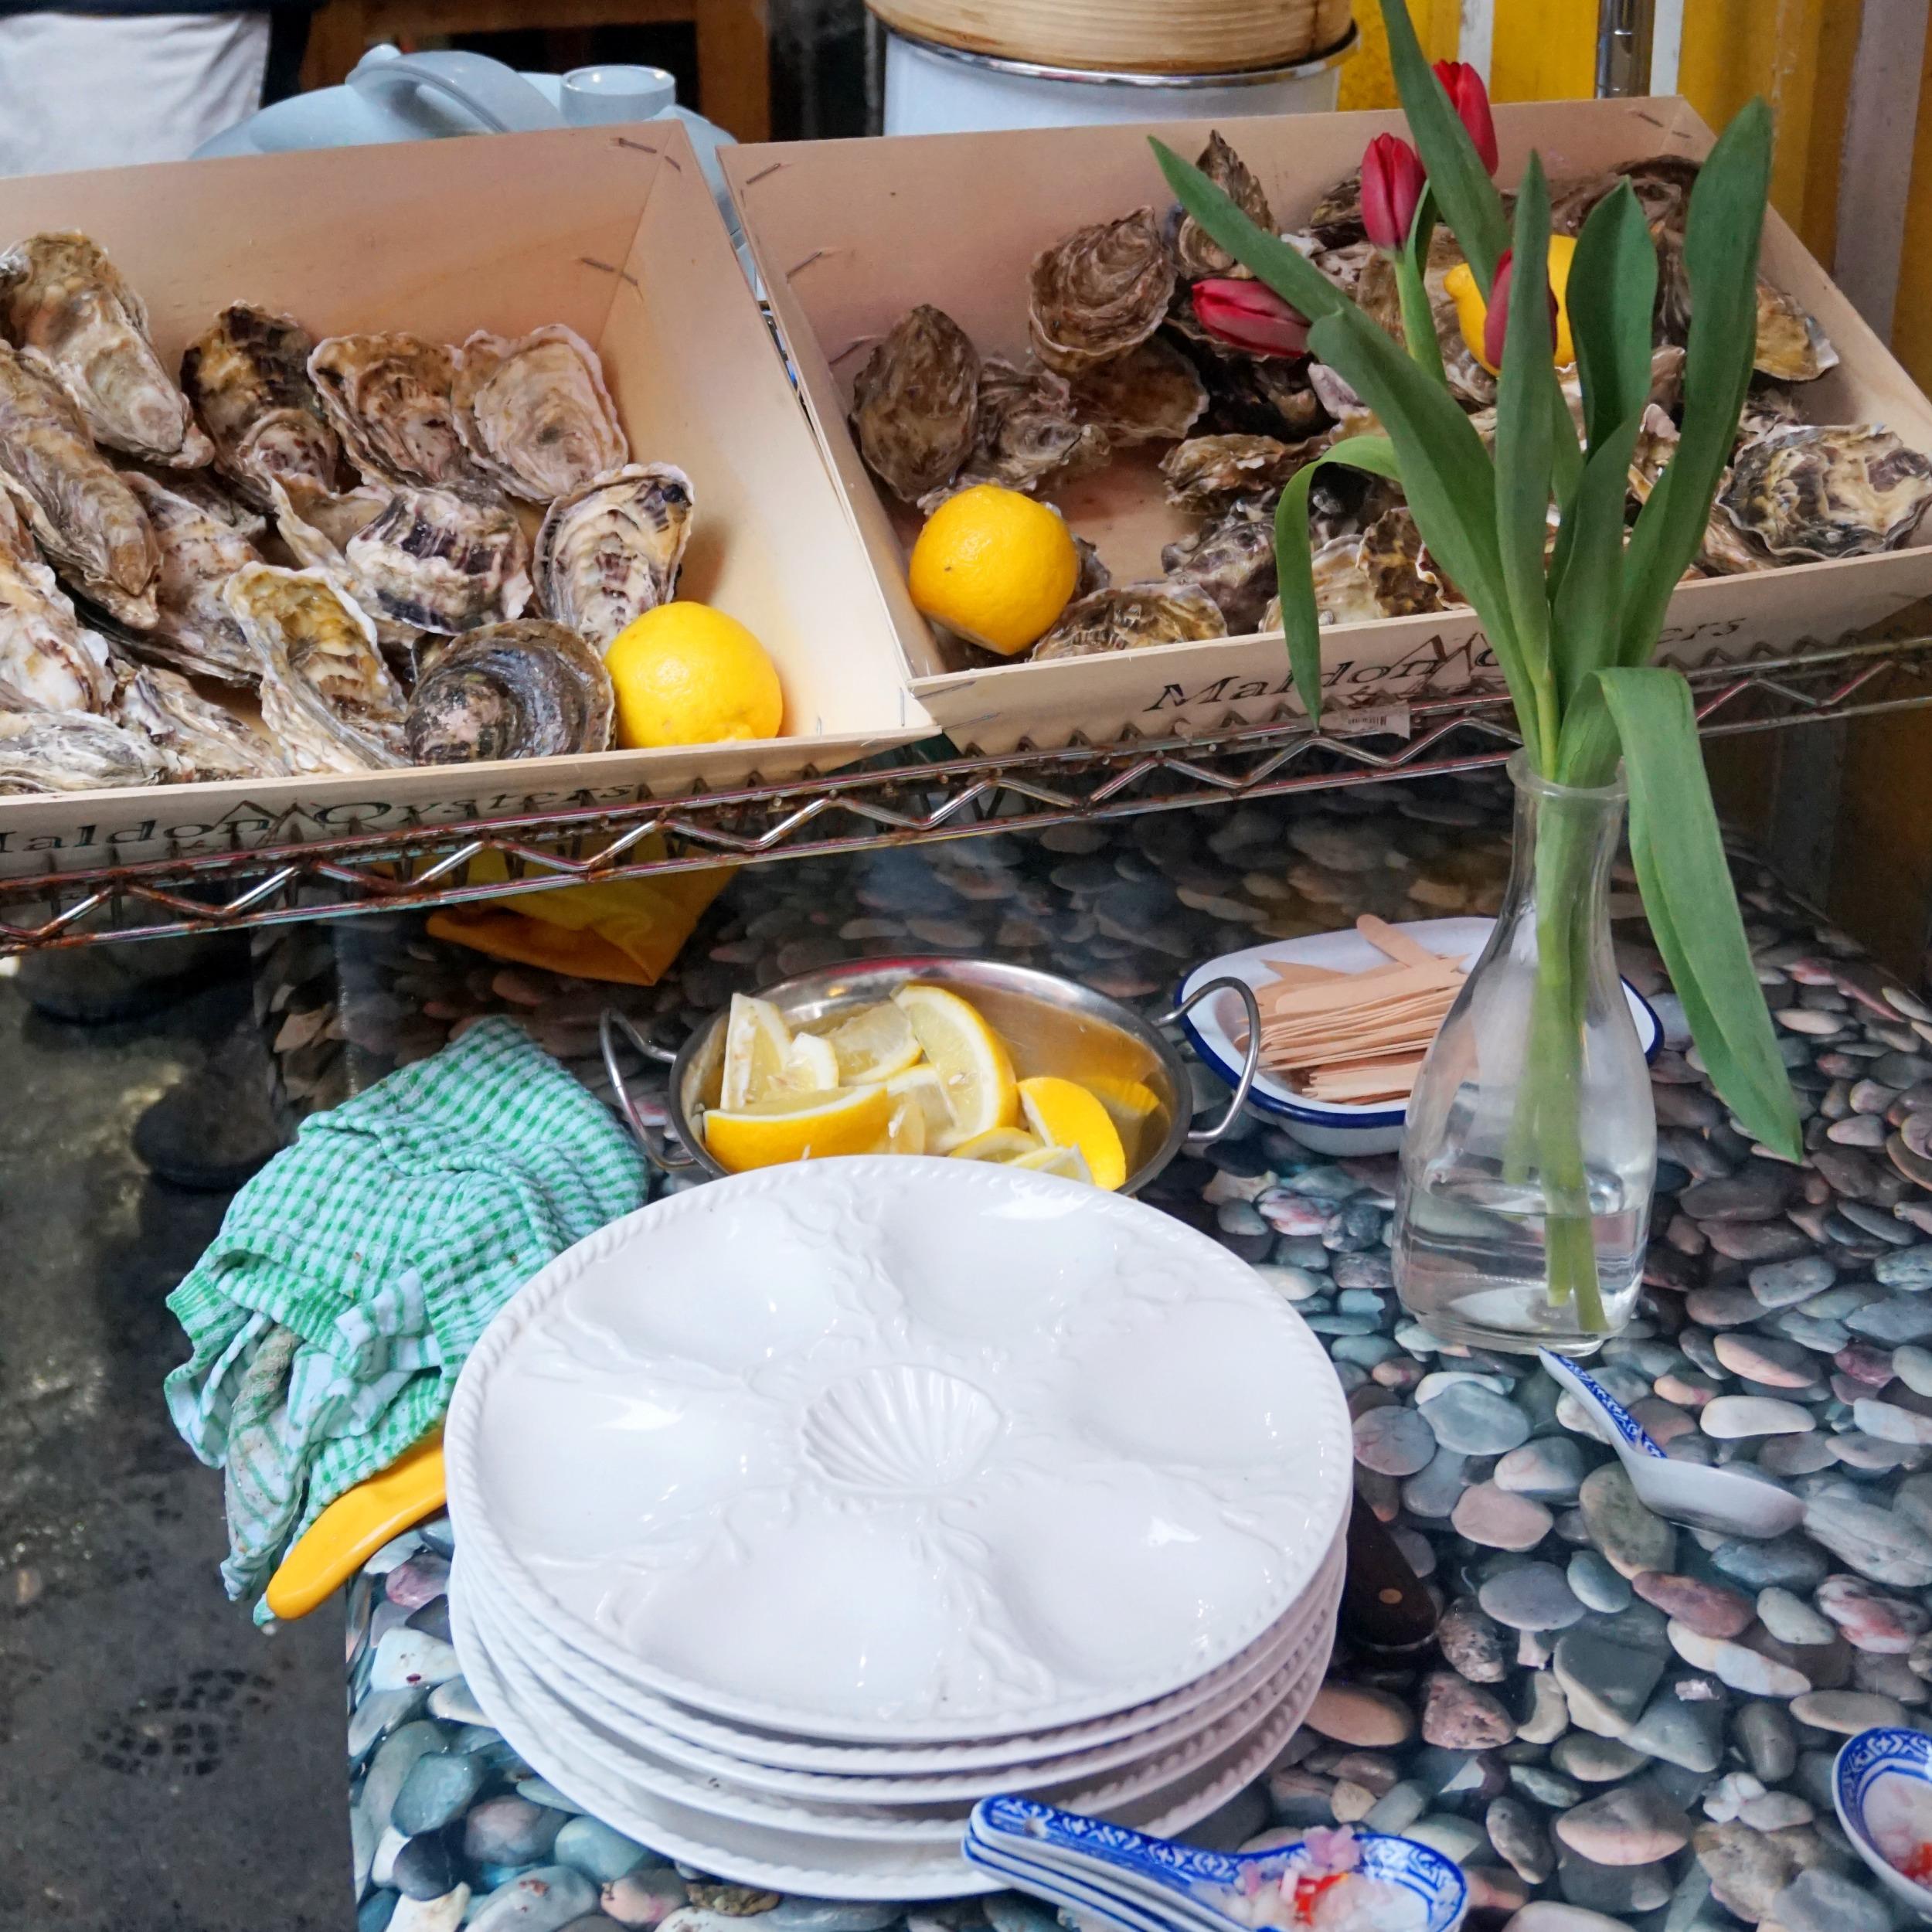 maltby-street-market-8